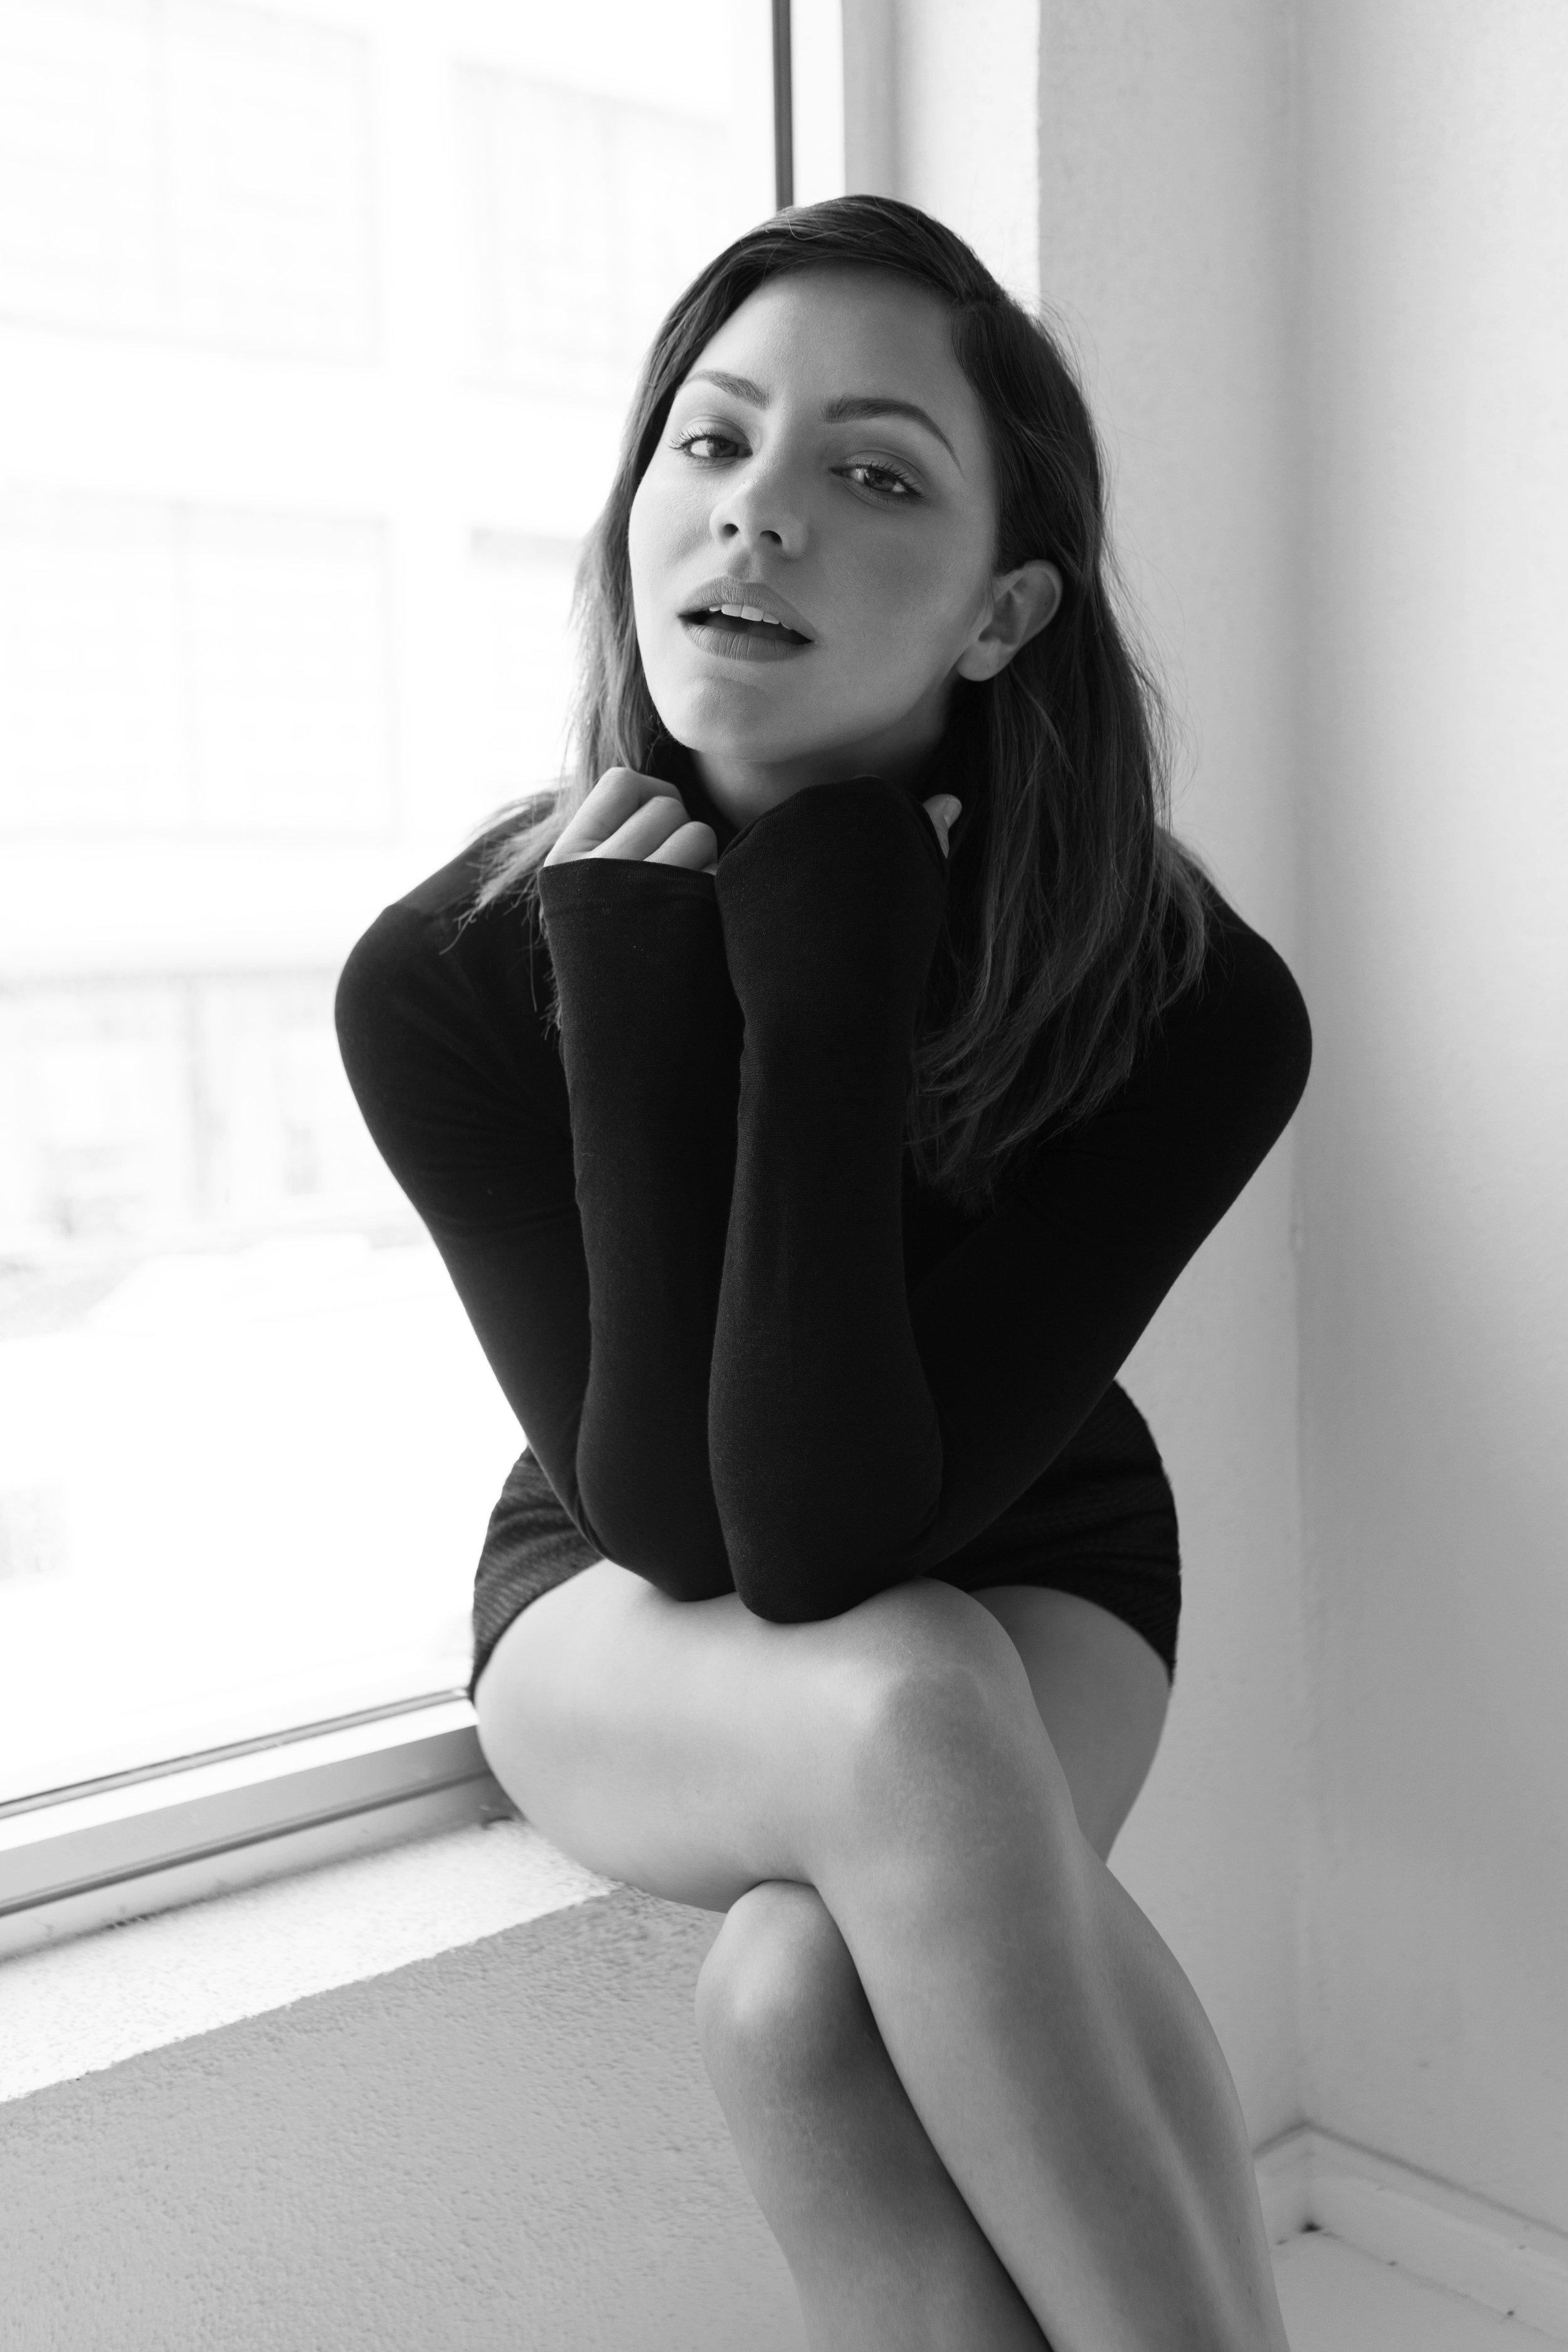 Katharine McPhee @ Elias Tahan Photoshoot